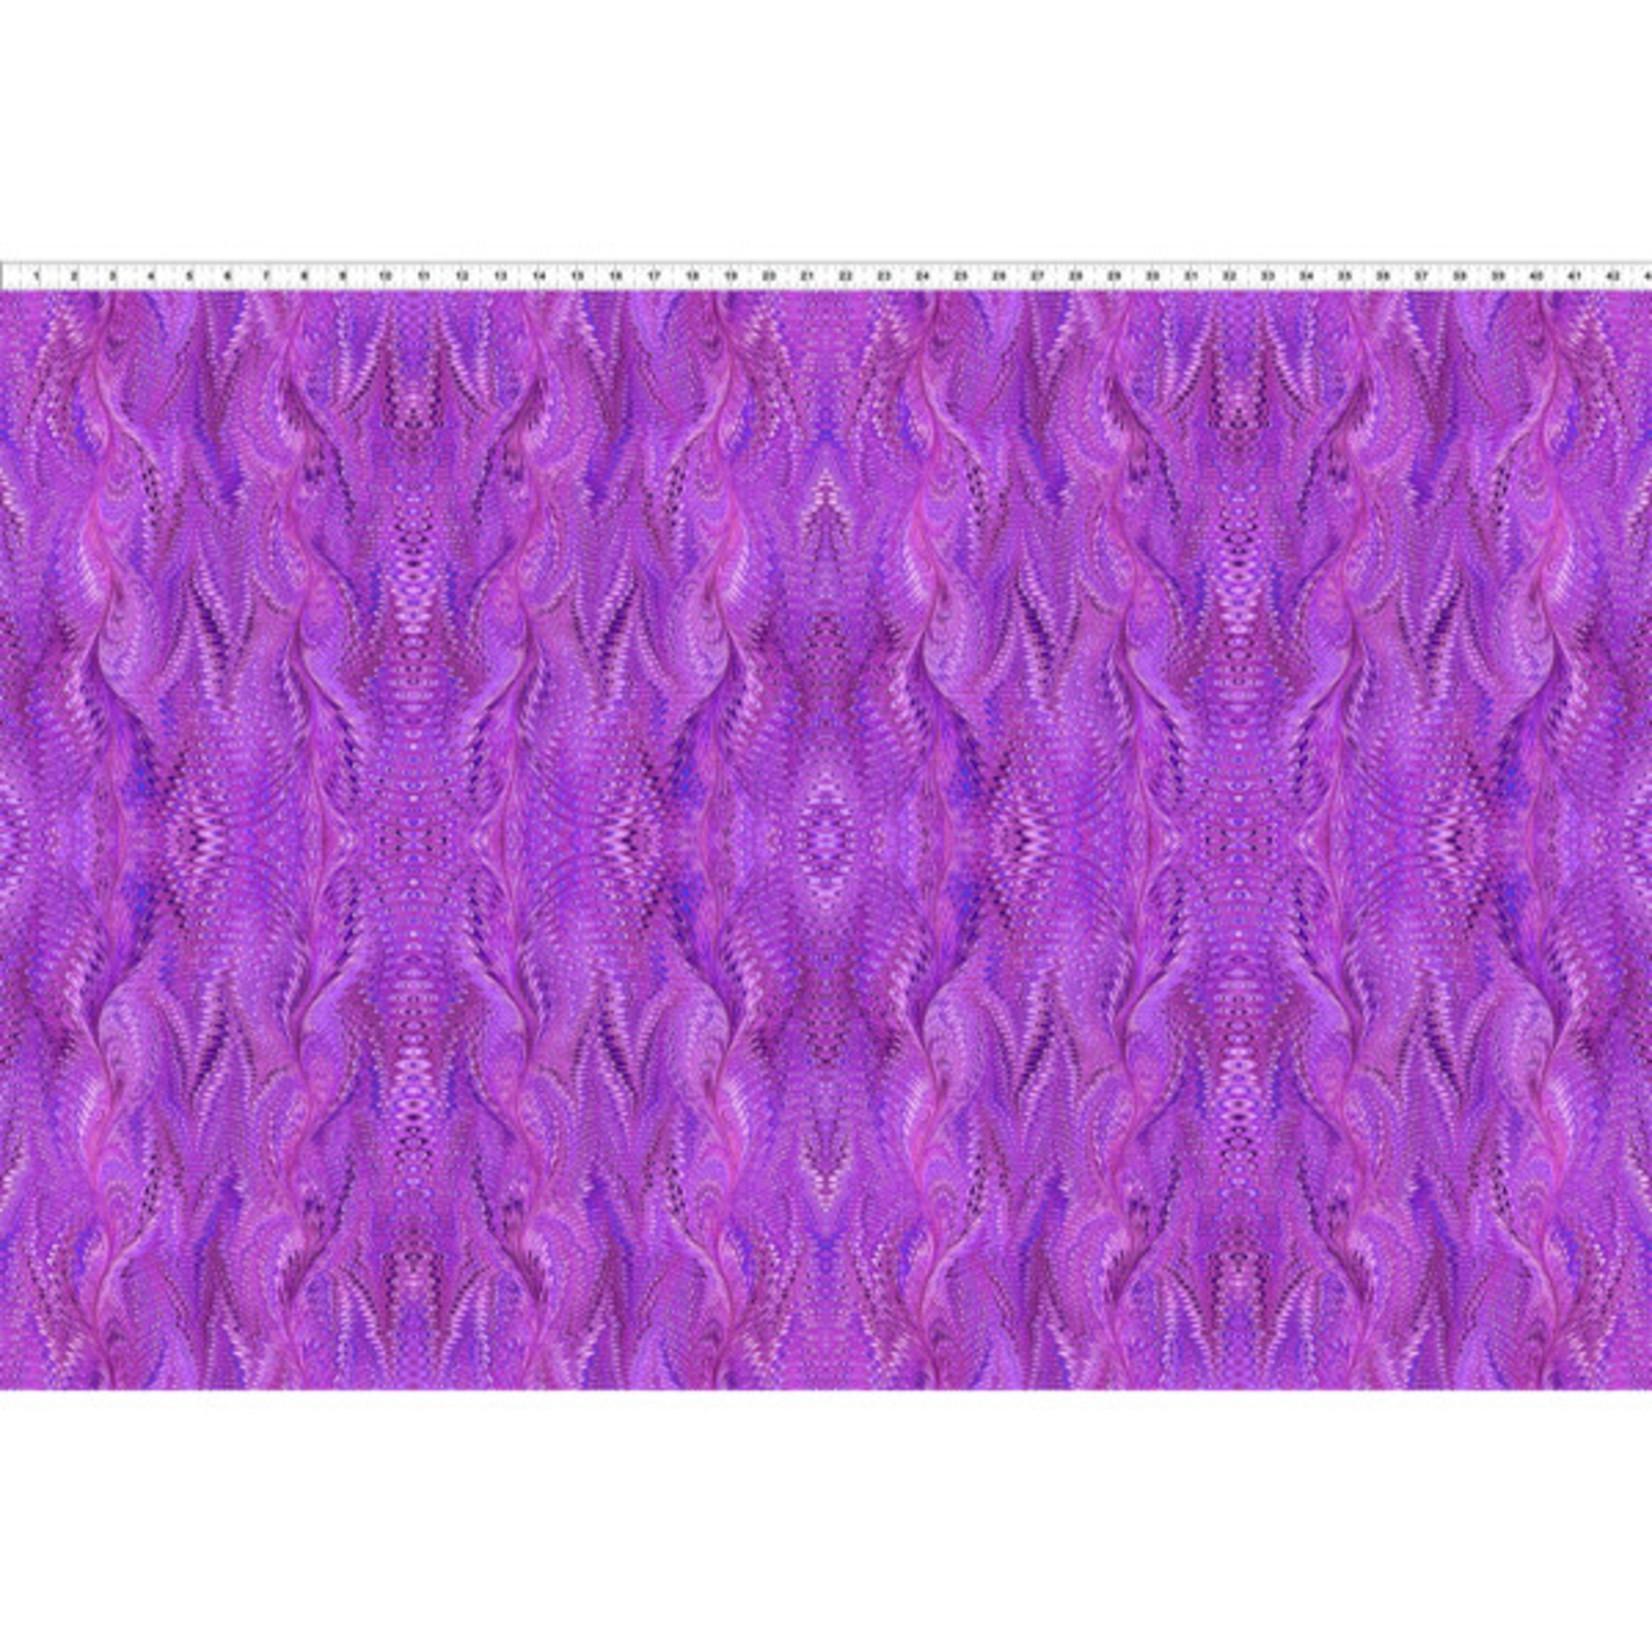 In the Beginning Fabrics Marble Essence - Milano - Magenta